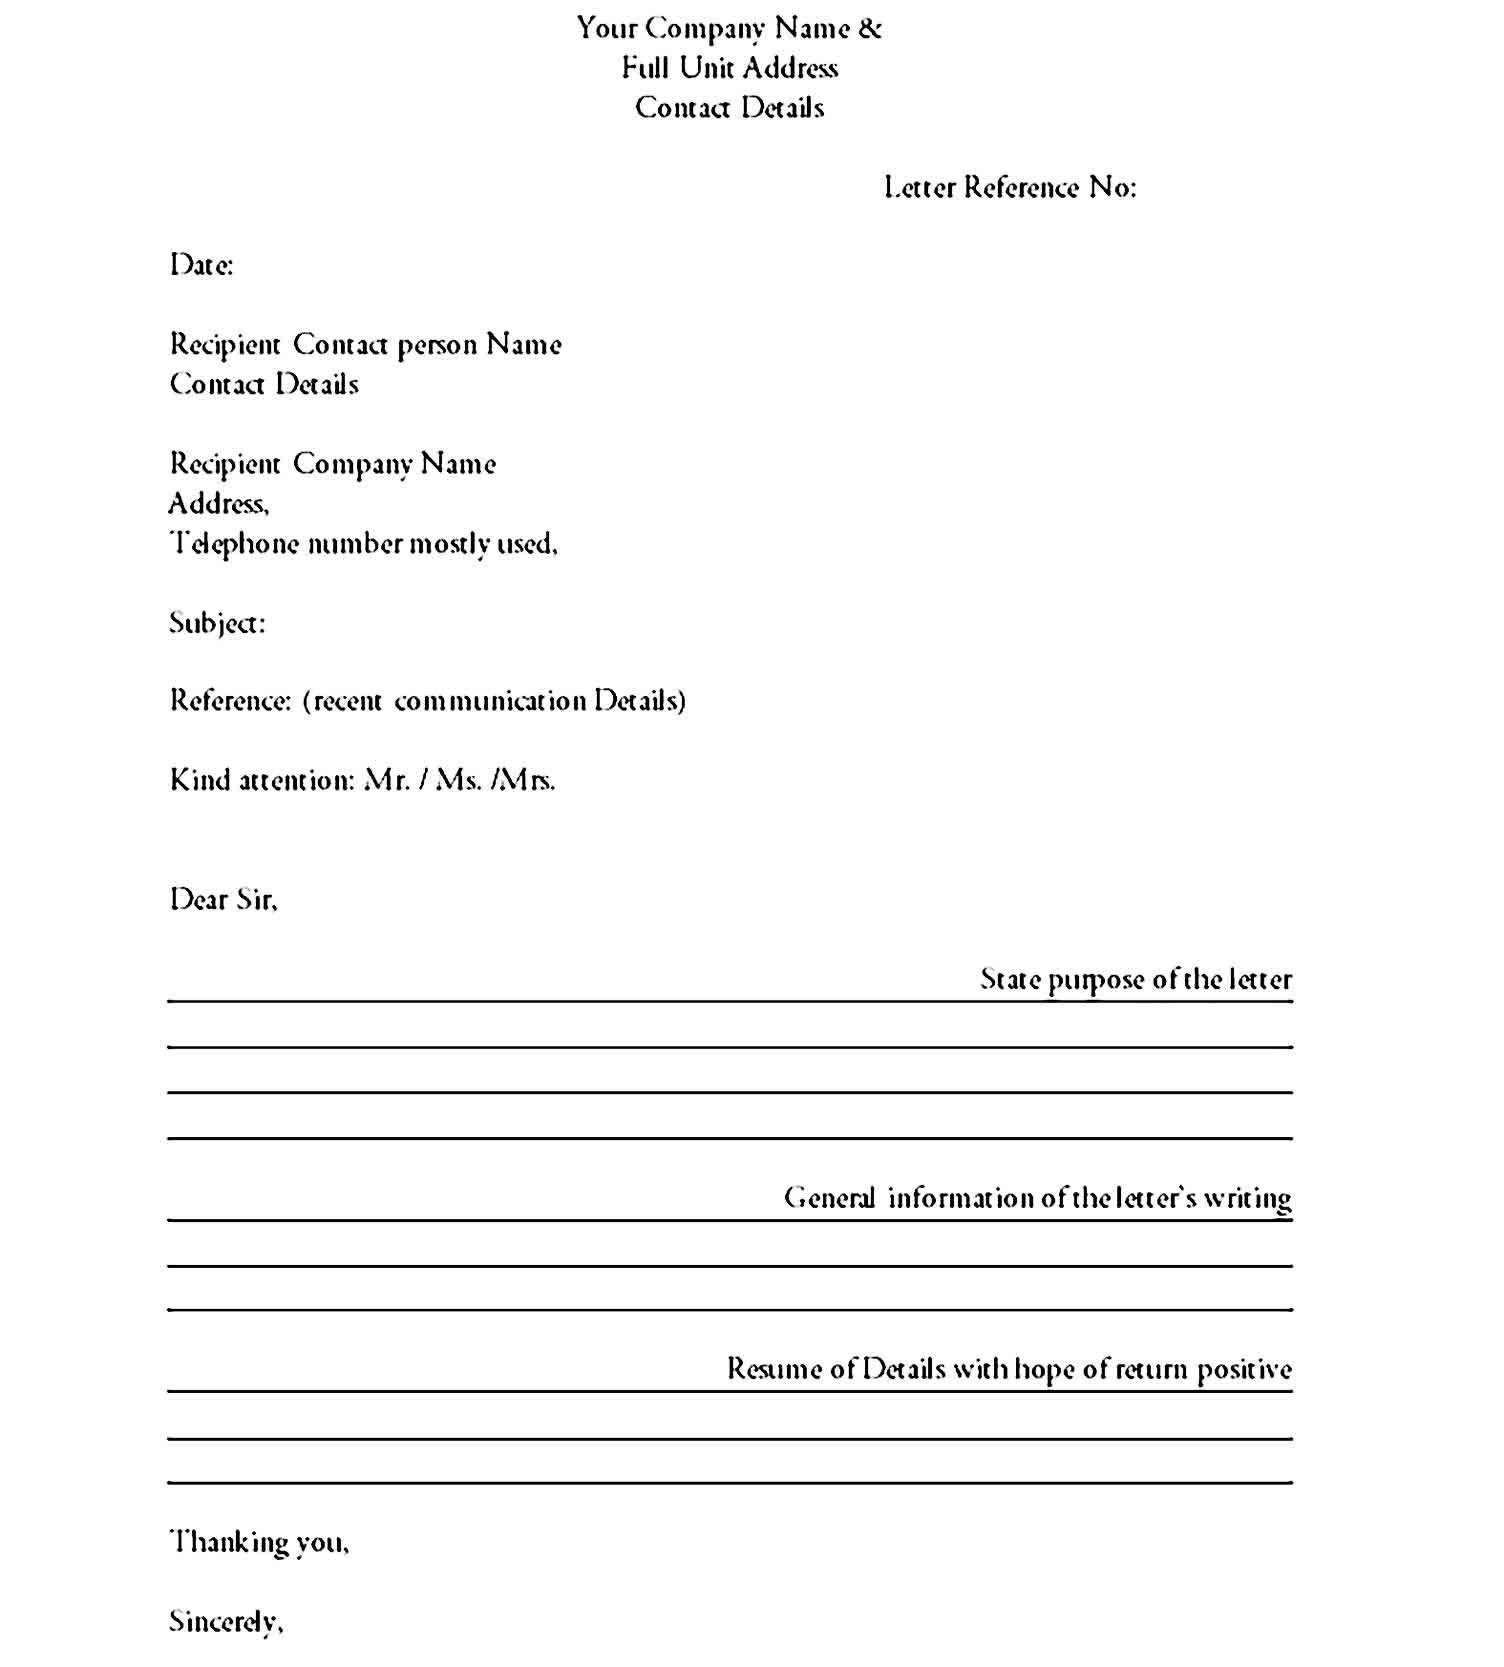 Business Letter Format Sample Business Letter Format Formal Business Letter Letter Format Sample [ 1667 x 1504 Pixel ]